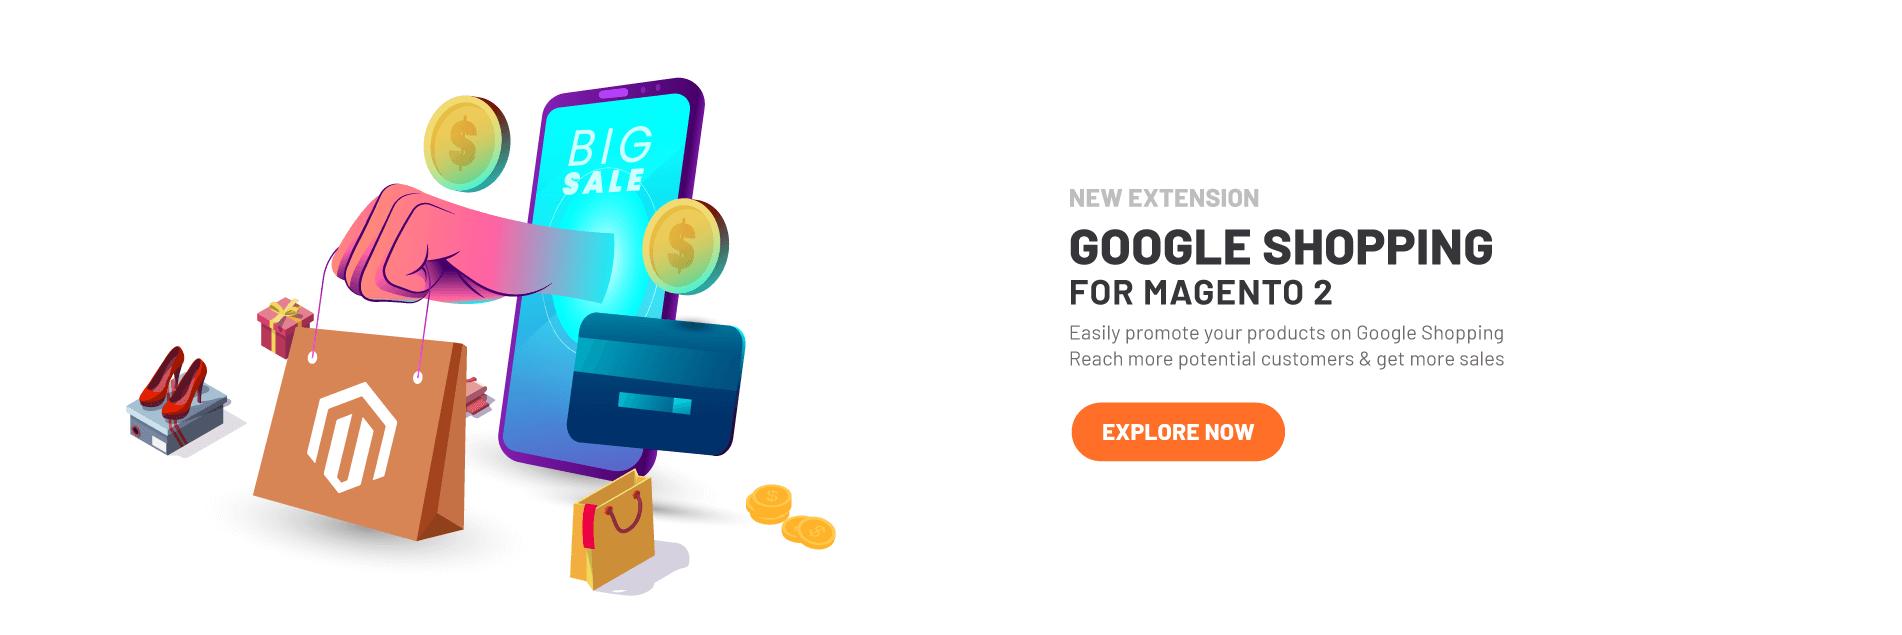 Google Shopping Magento 2